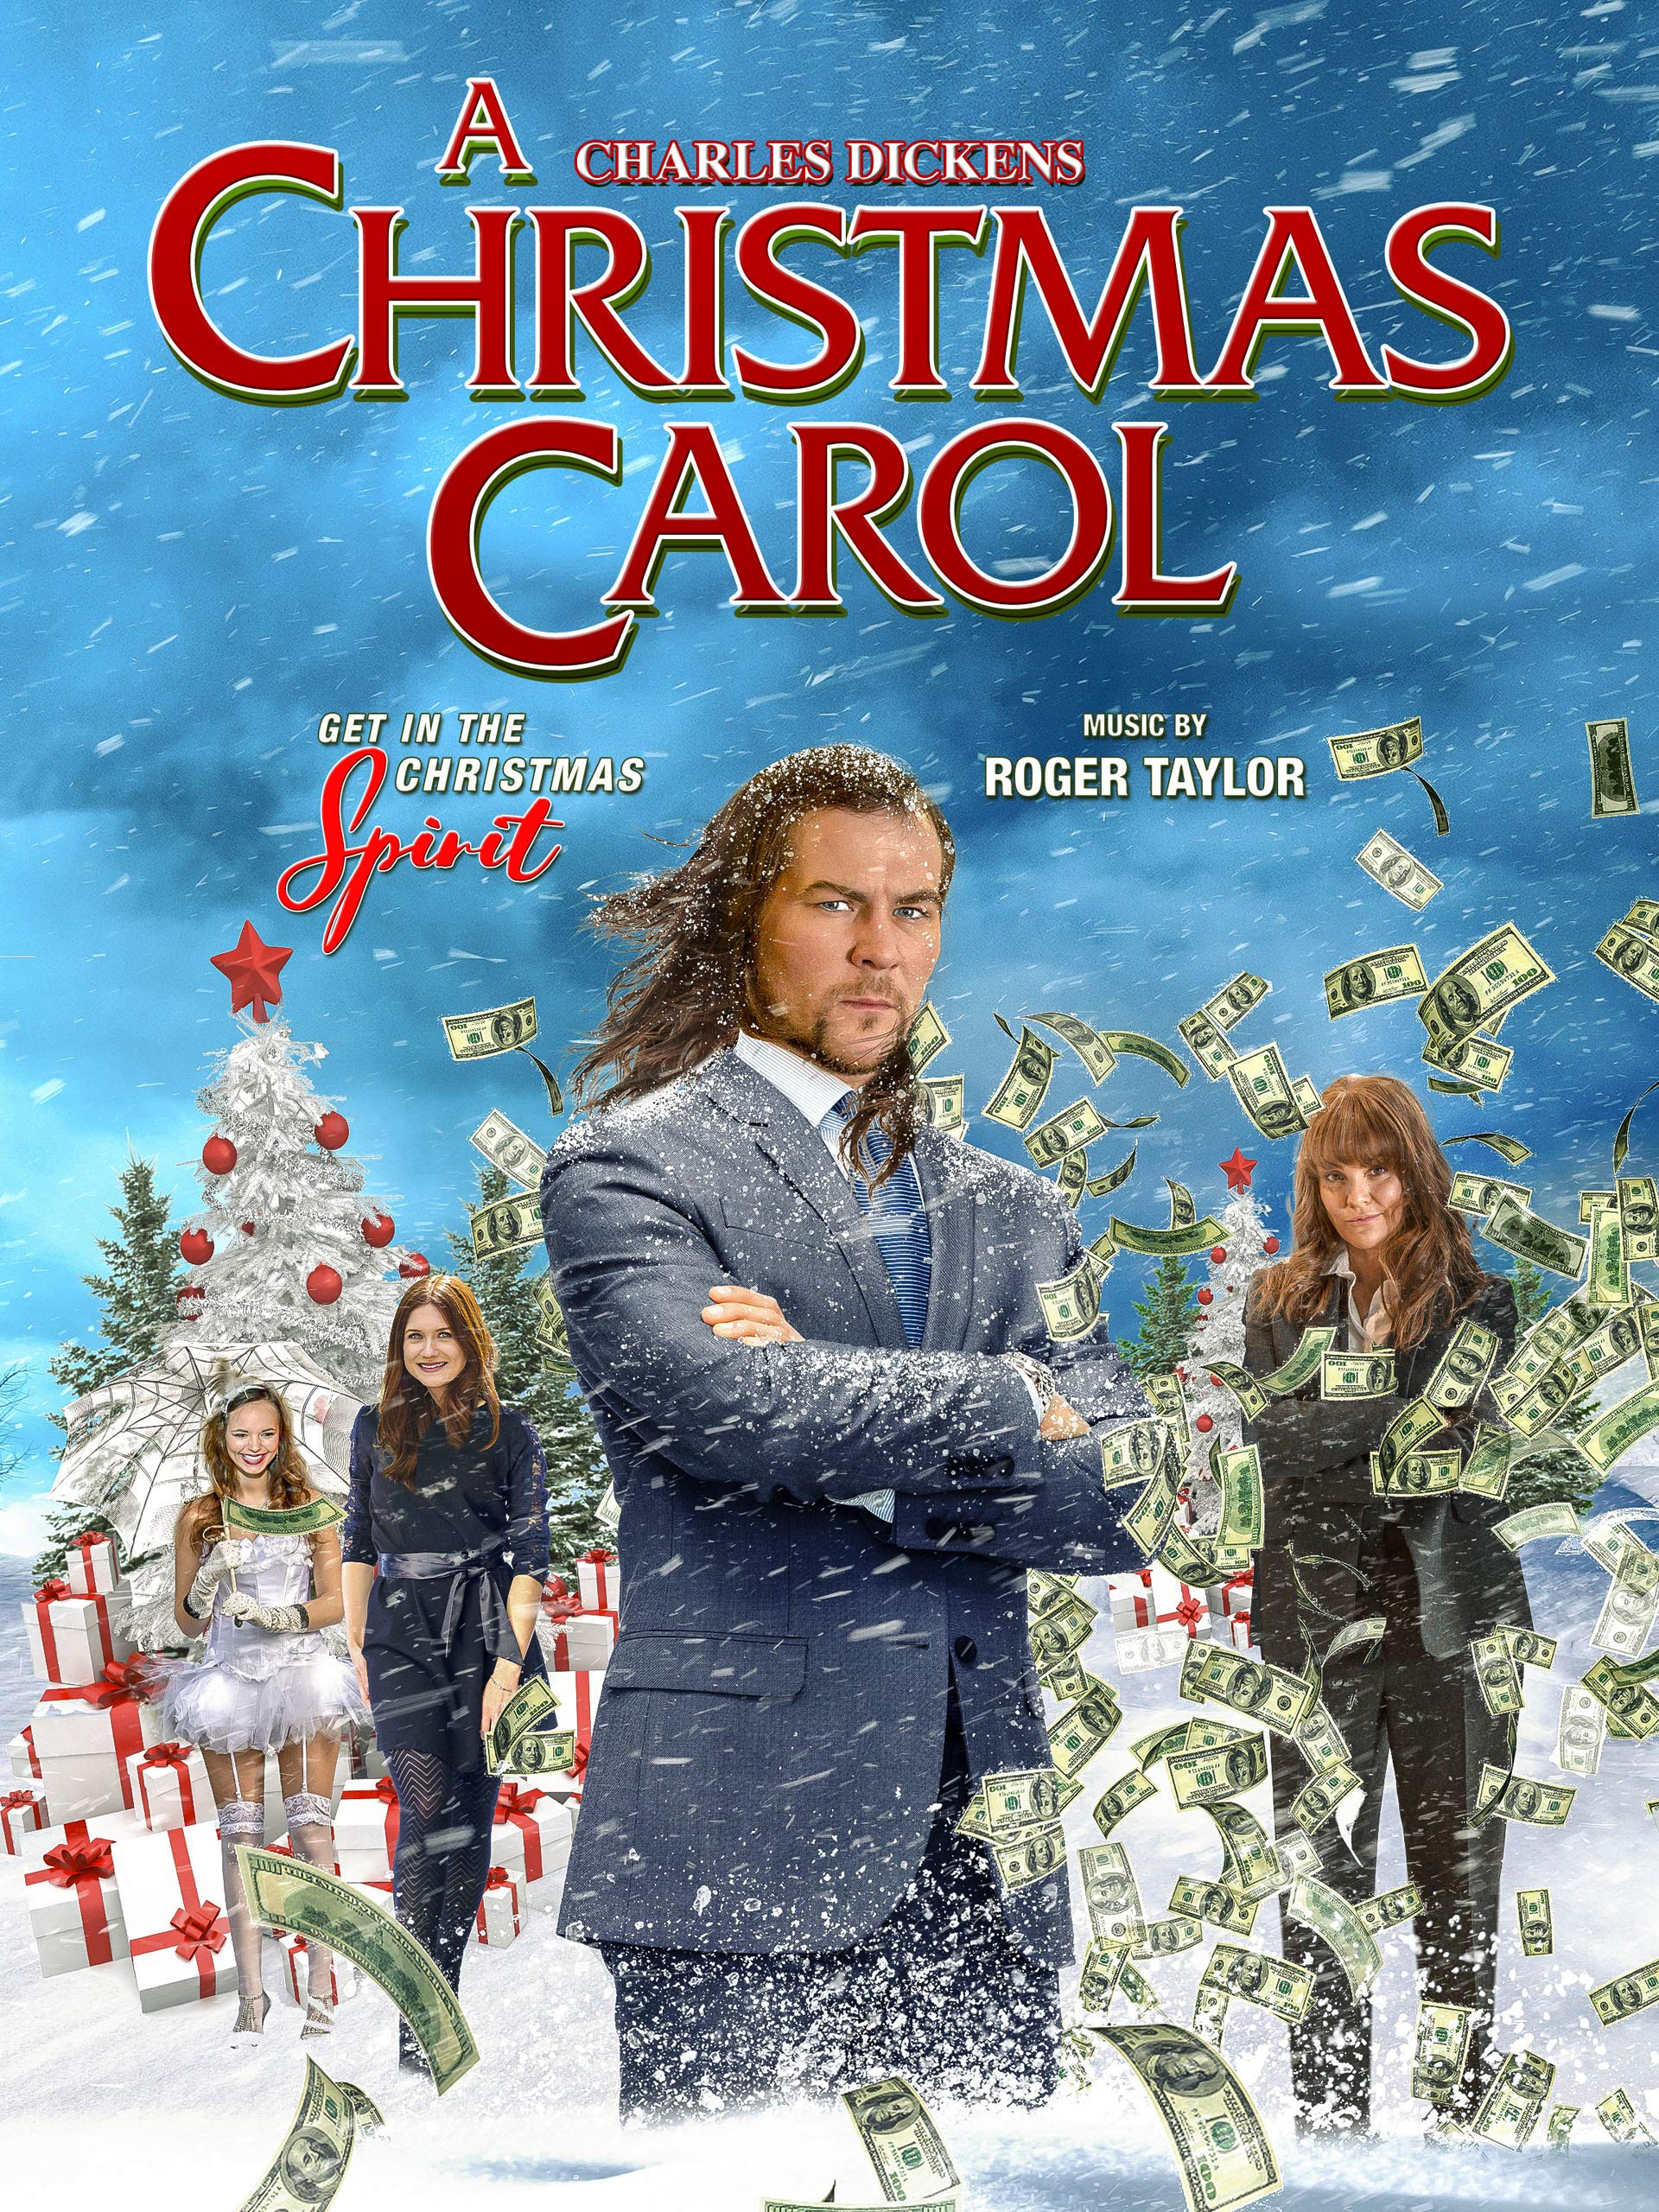 A Christmas Carol Amazon.com: Watch A Christmas Carol | Prime Video